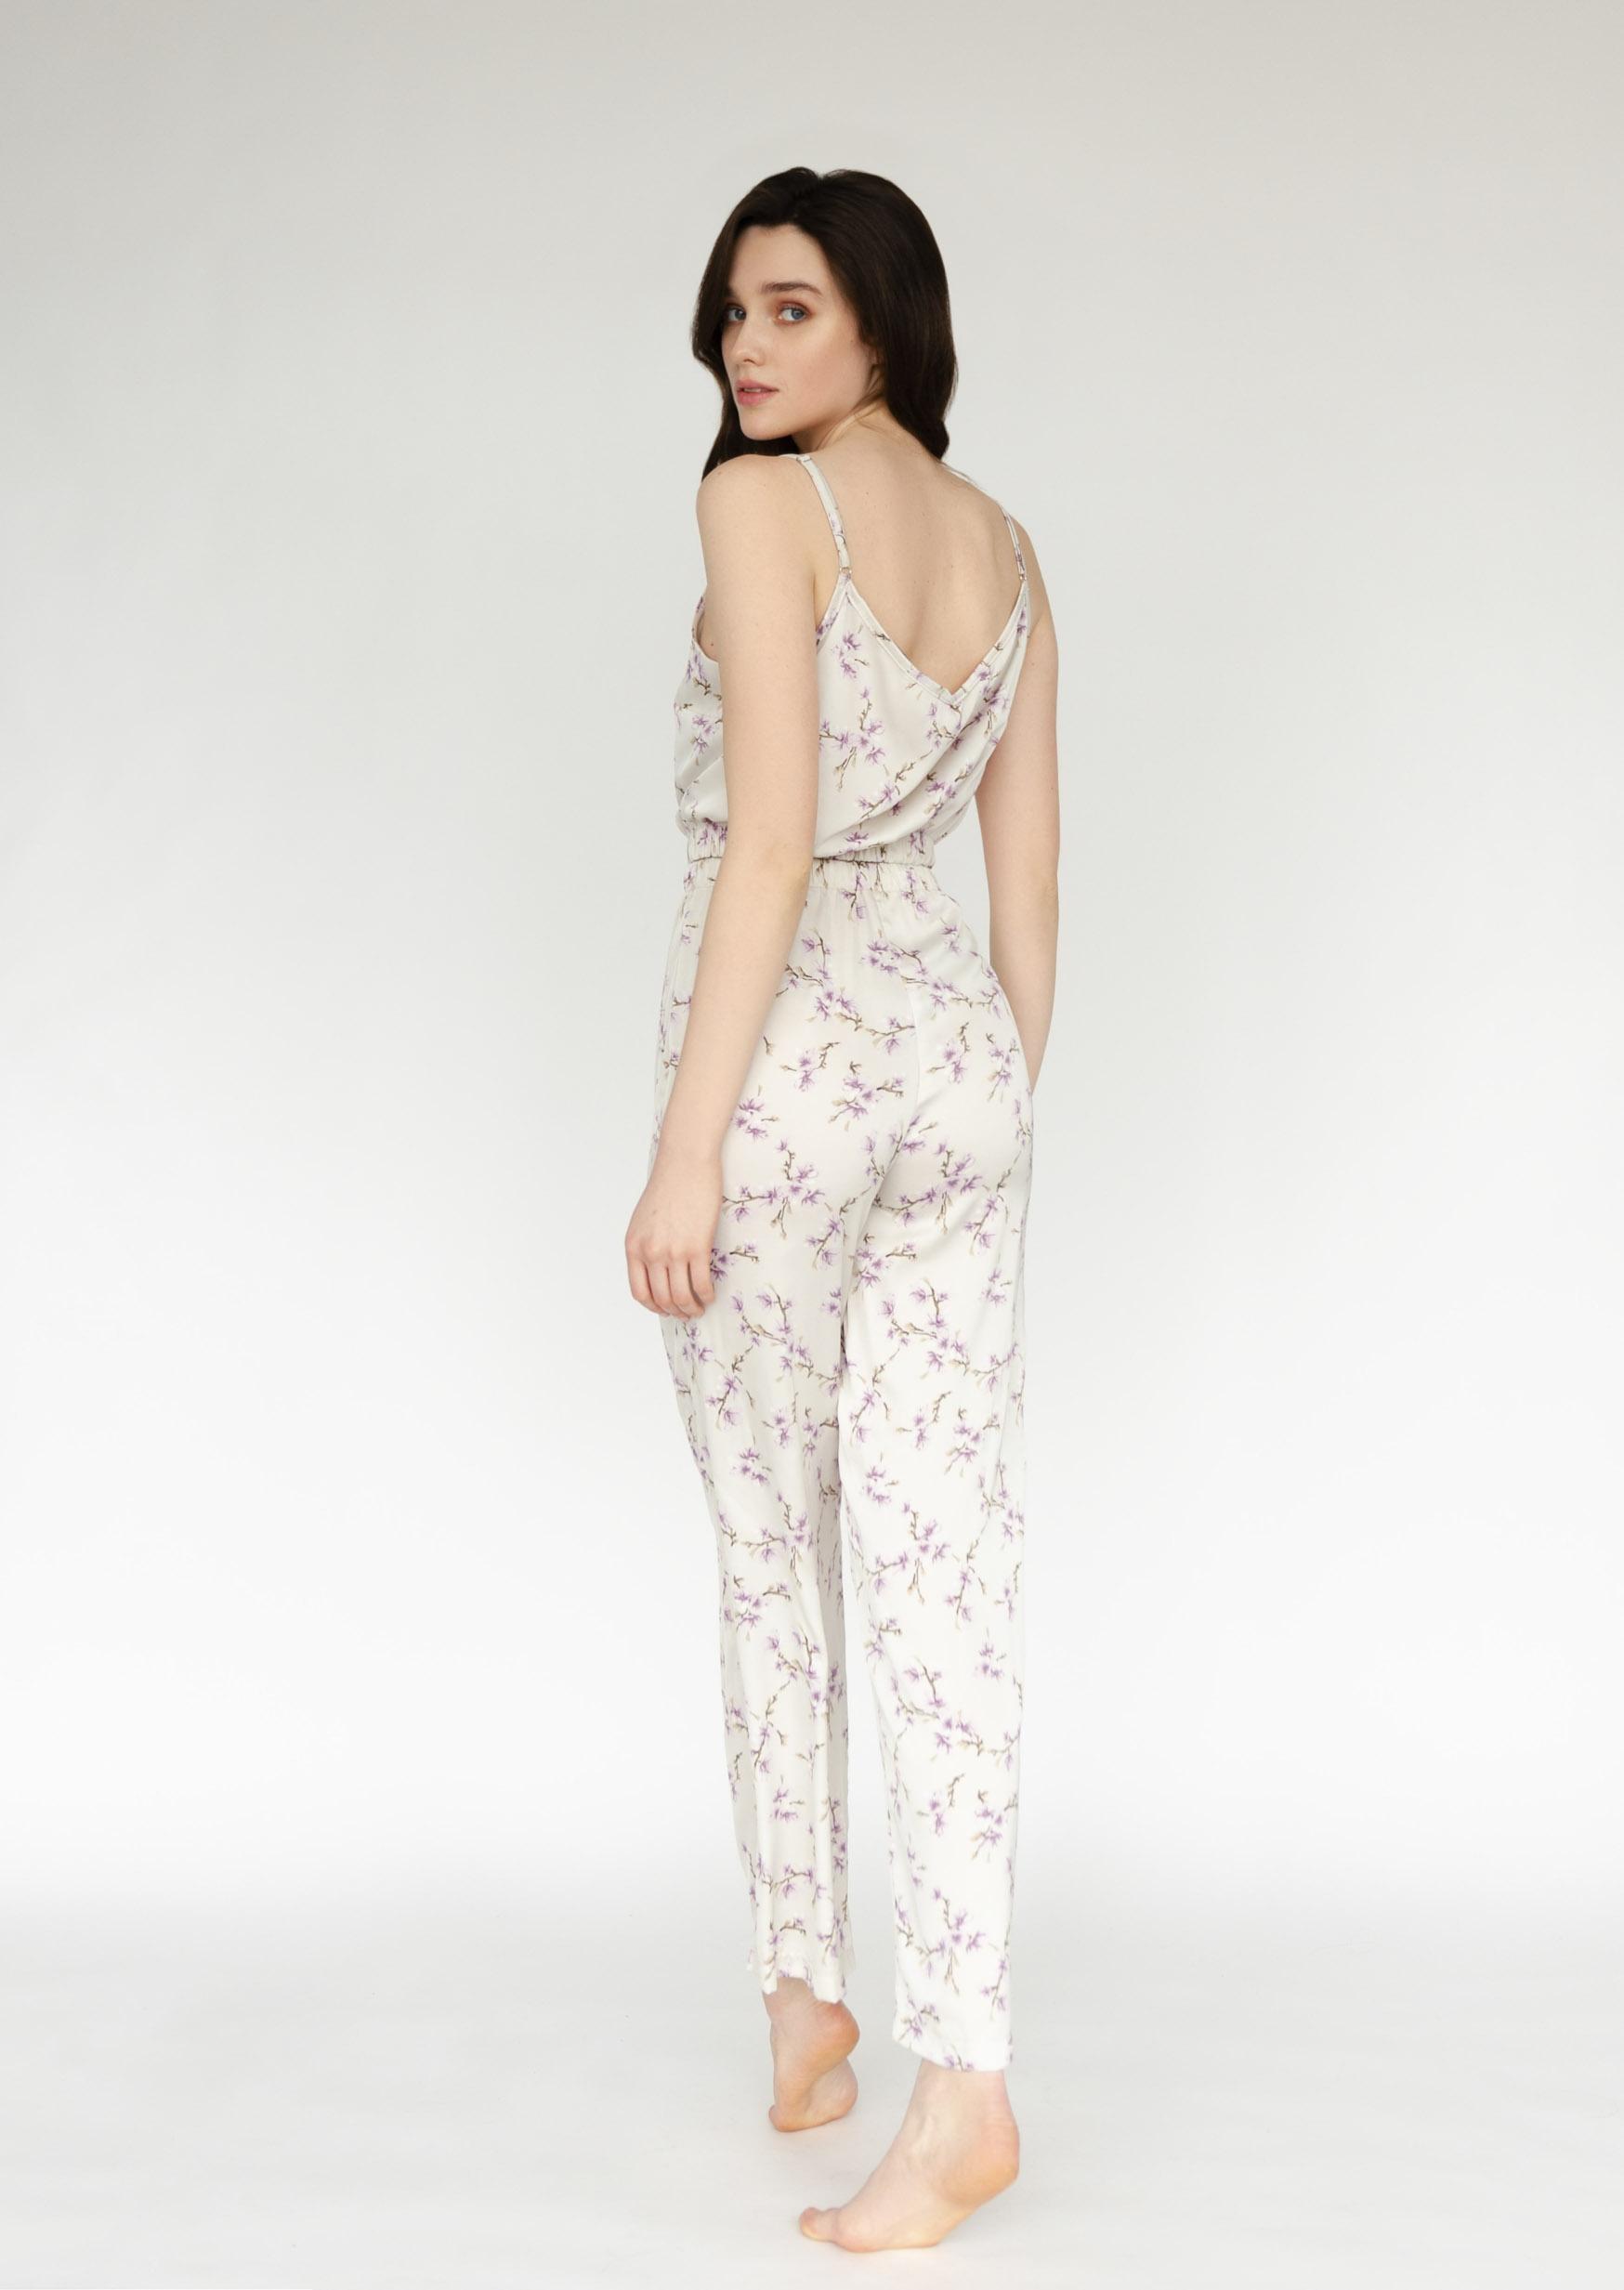 Lavender Fog Loungewear Set